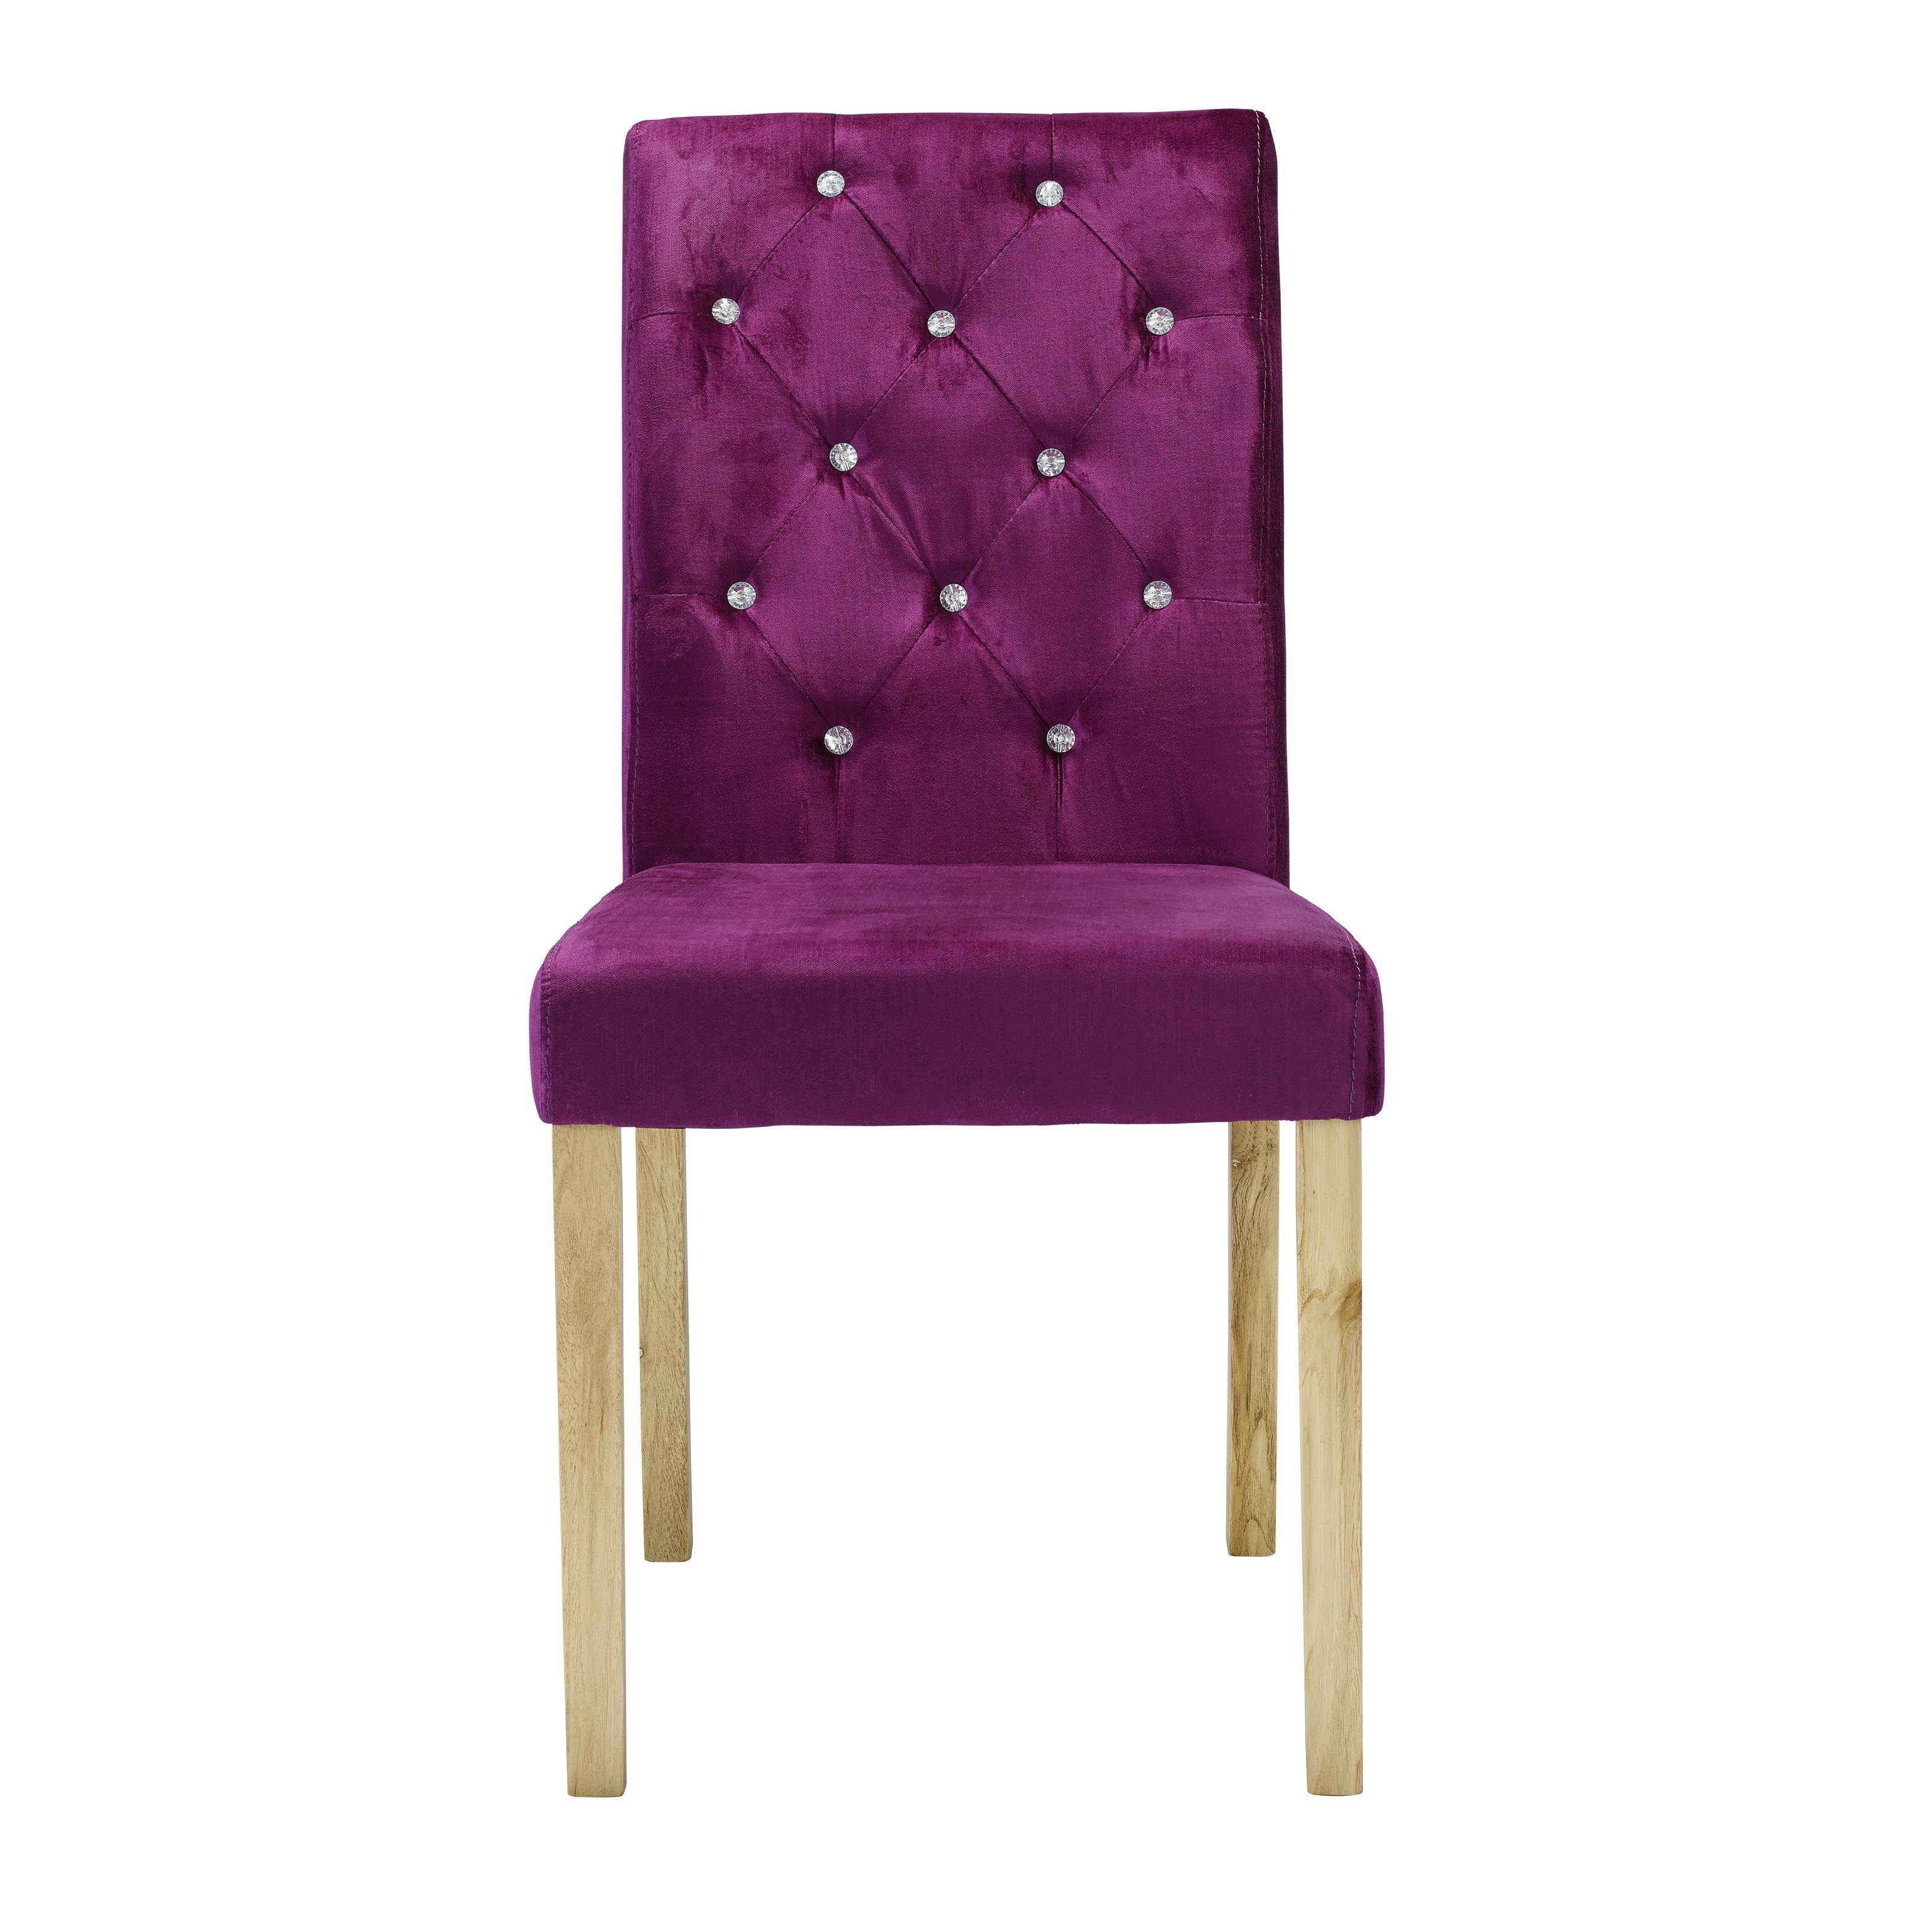 Paris Chair Purple Velvet (Pack of 2)